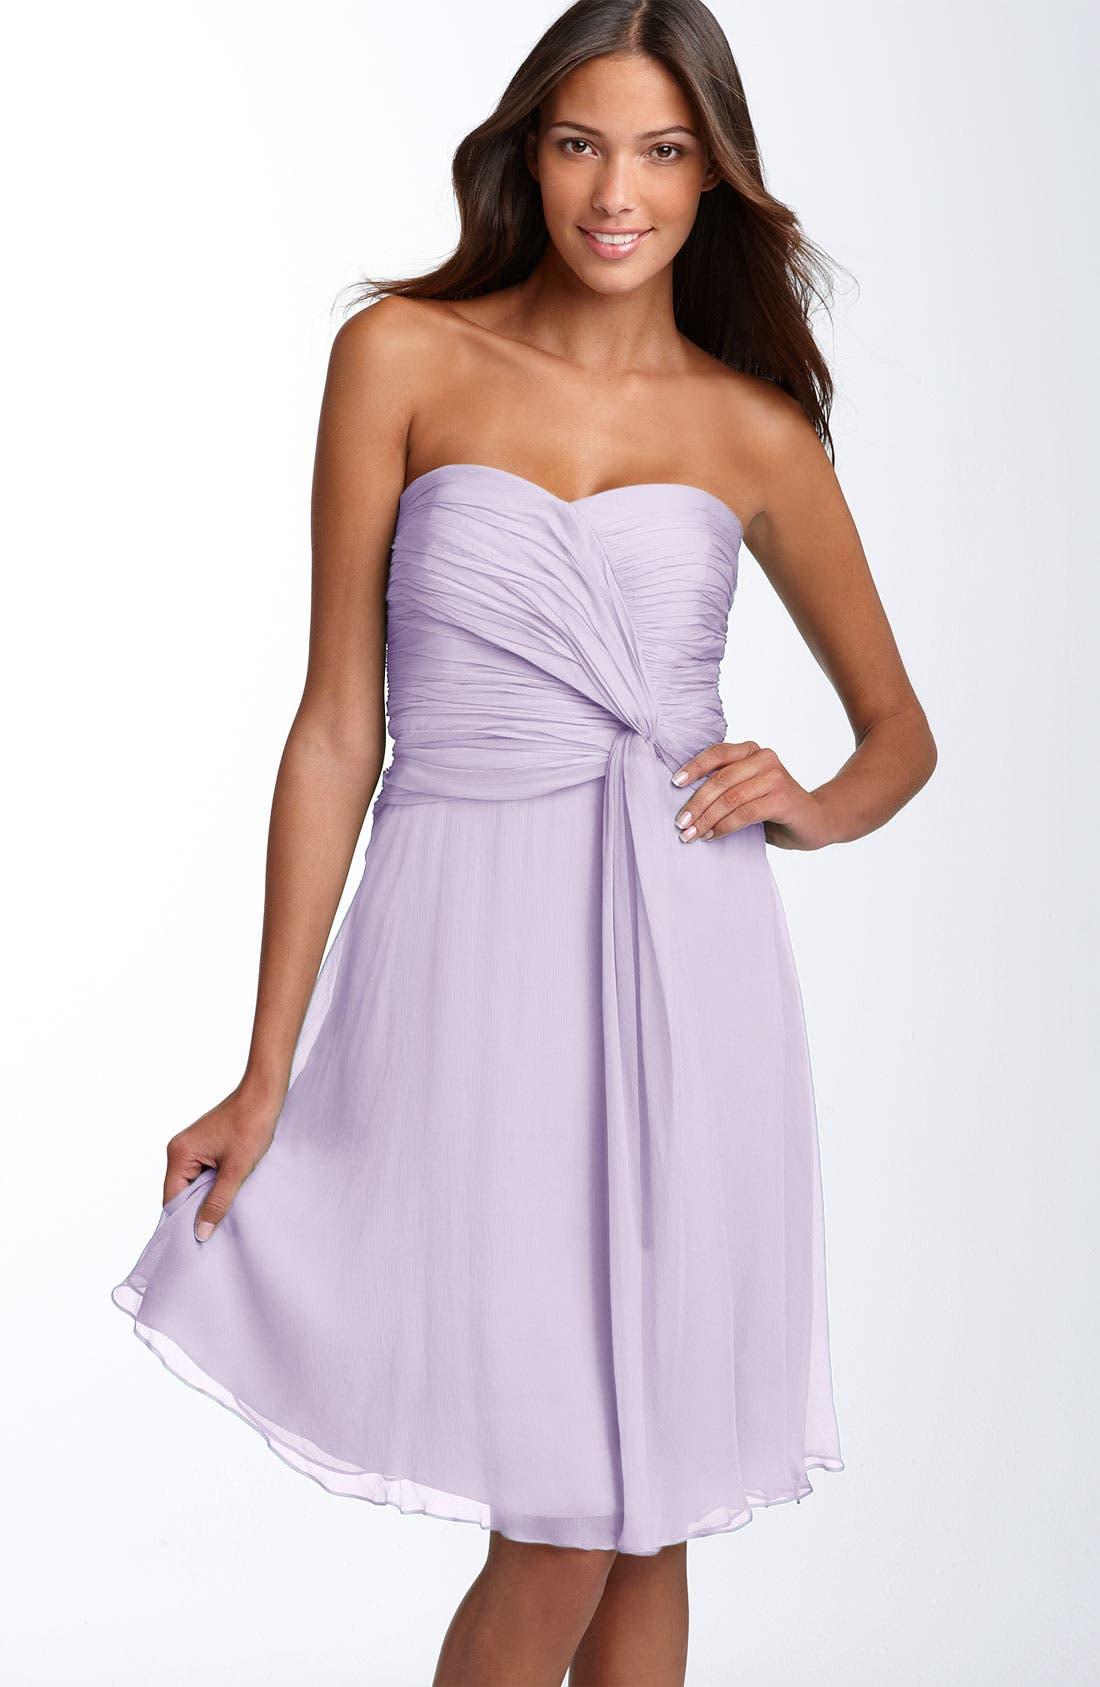 Alternate Image 1 Selected - Donna Morgan Twist Detail Chiffon Dress